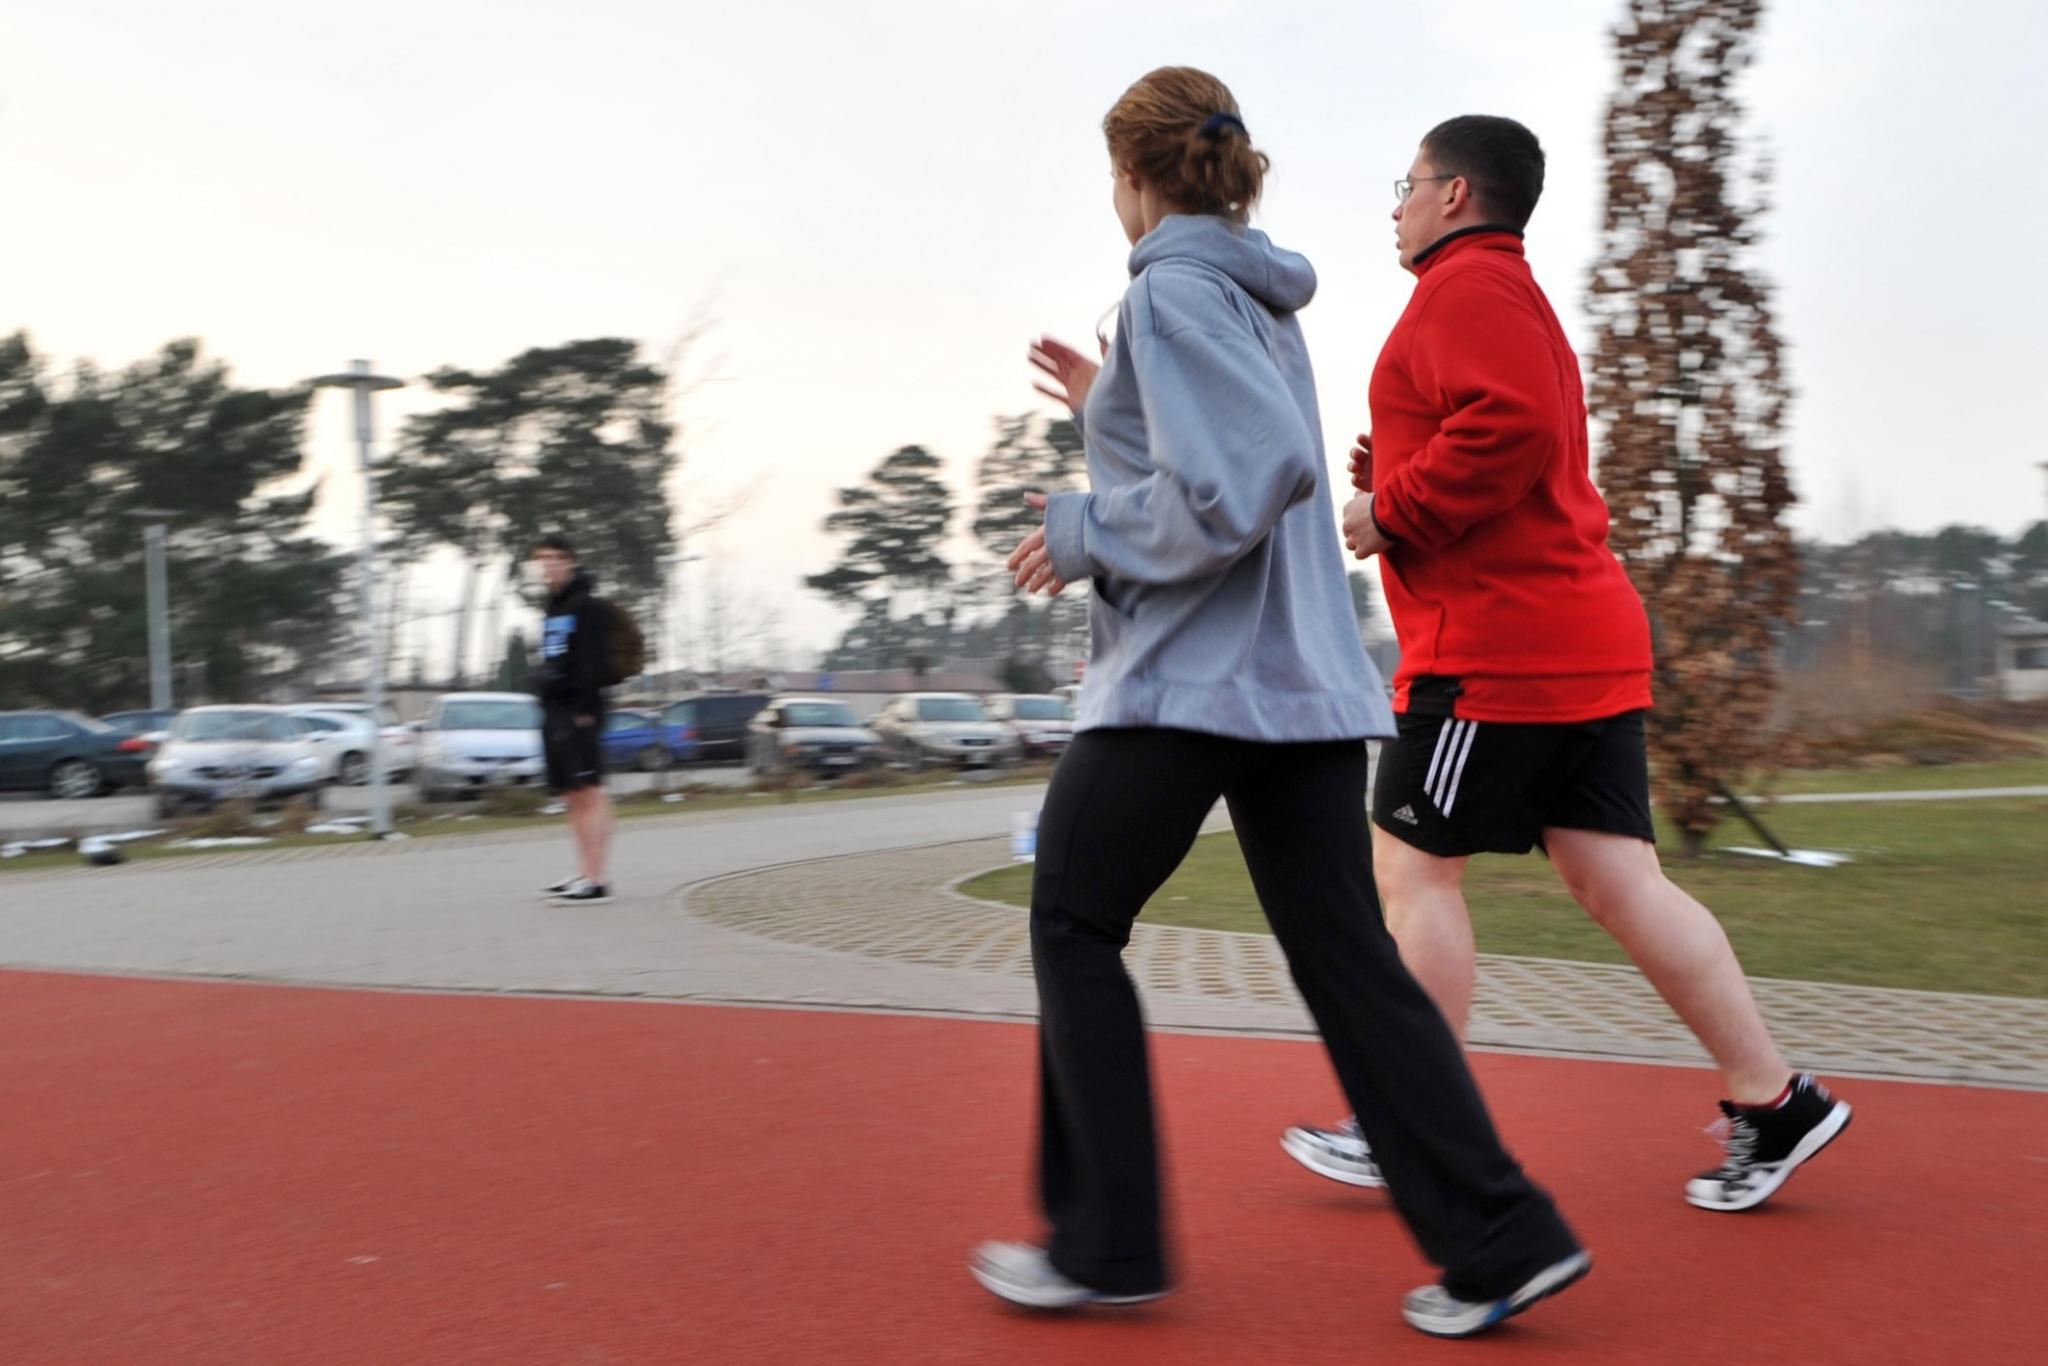 ChiRunning/Walking No Pain? All Gain! Injury Free 5K Program